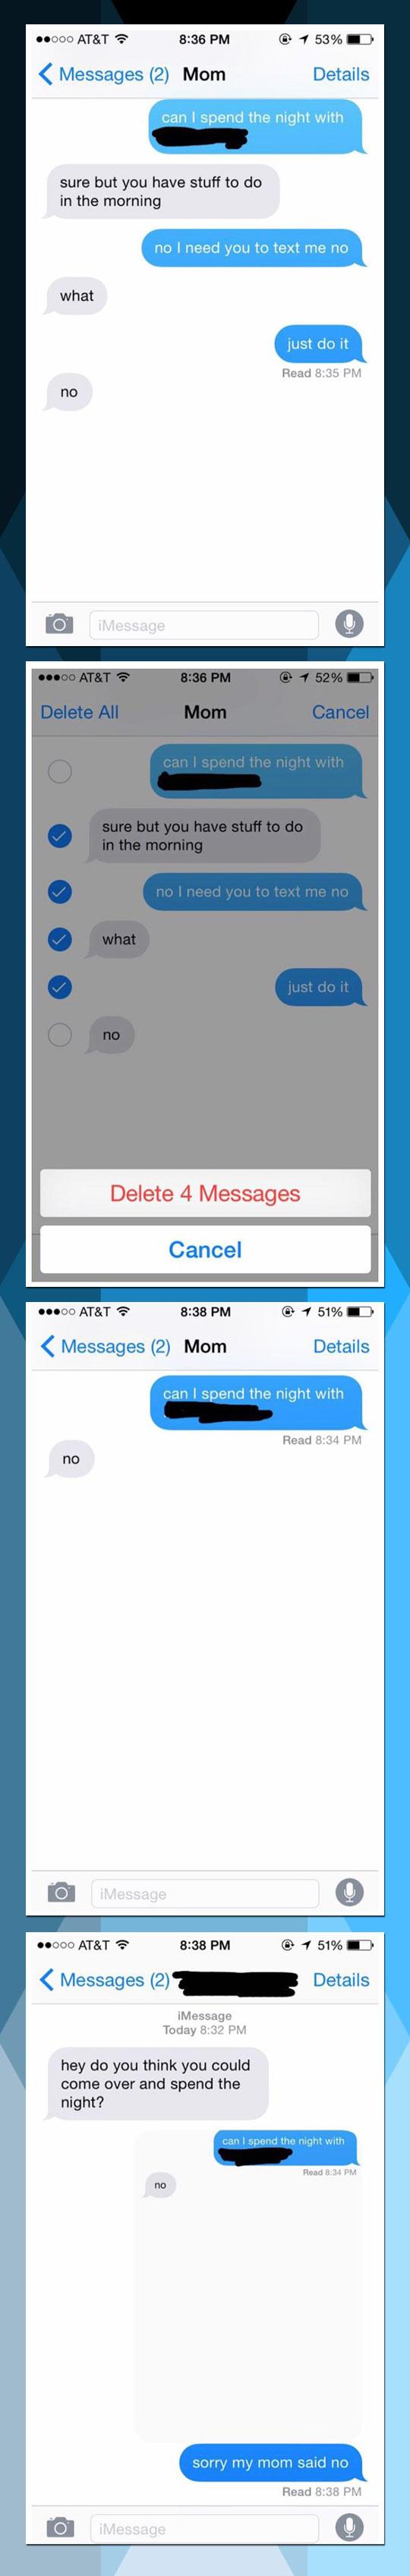 funny-girl-asking-mother-spend-night-boyfriend